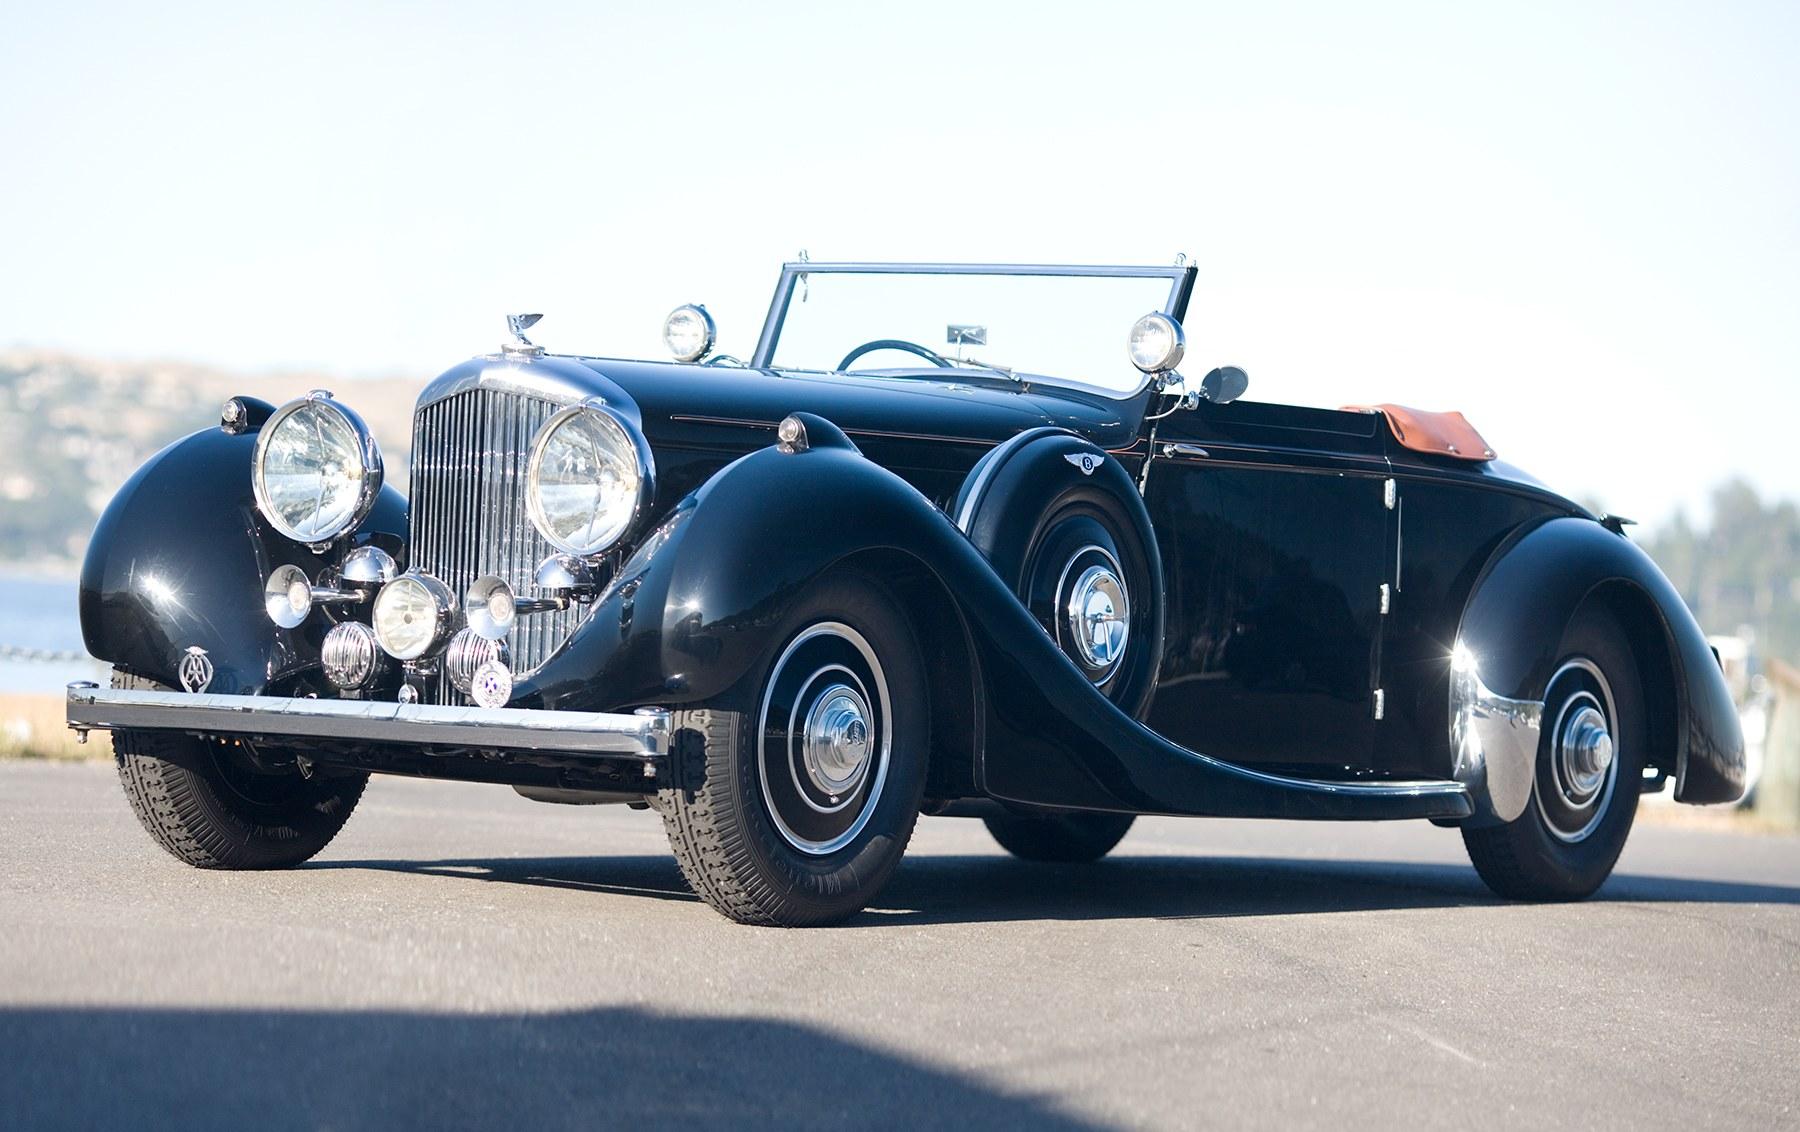 1940 Bentley 4 1/4-Liter Carlton Drophead Coupe